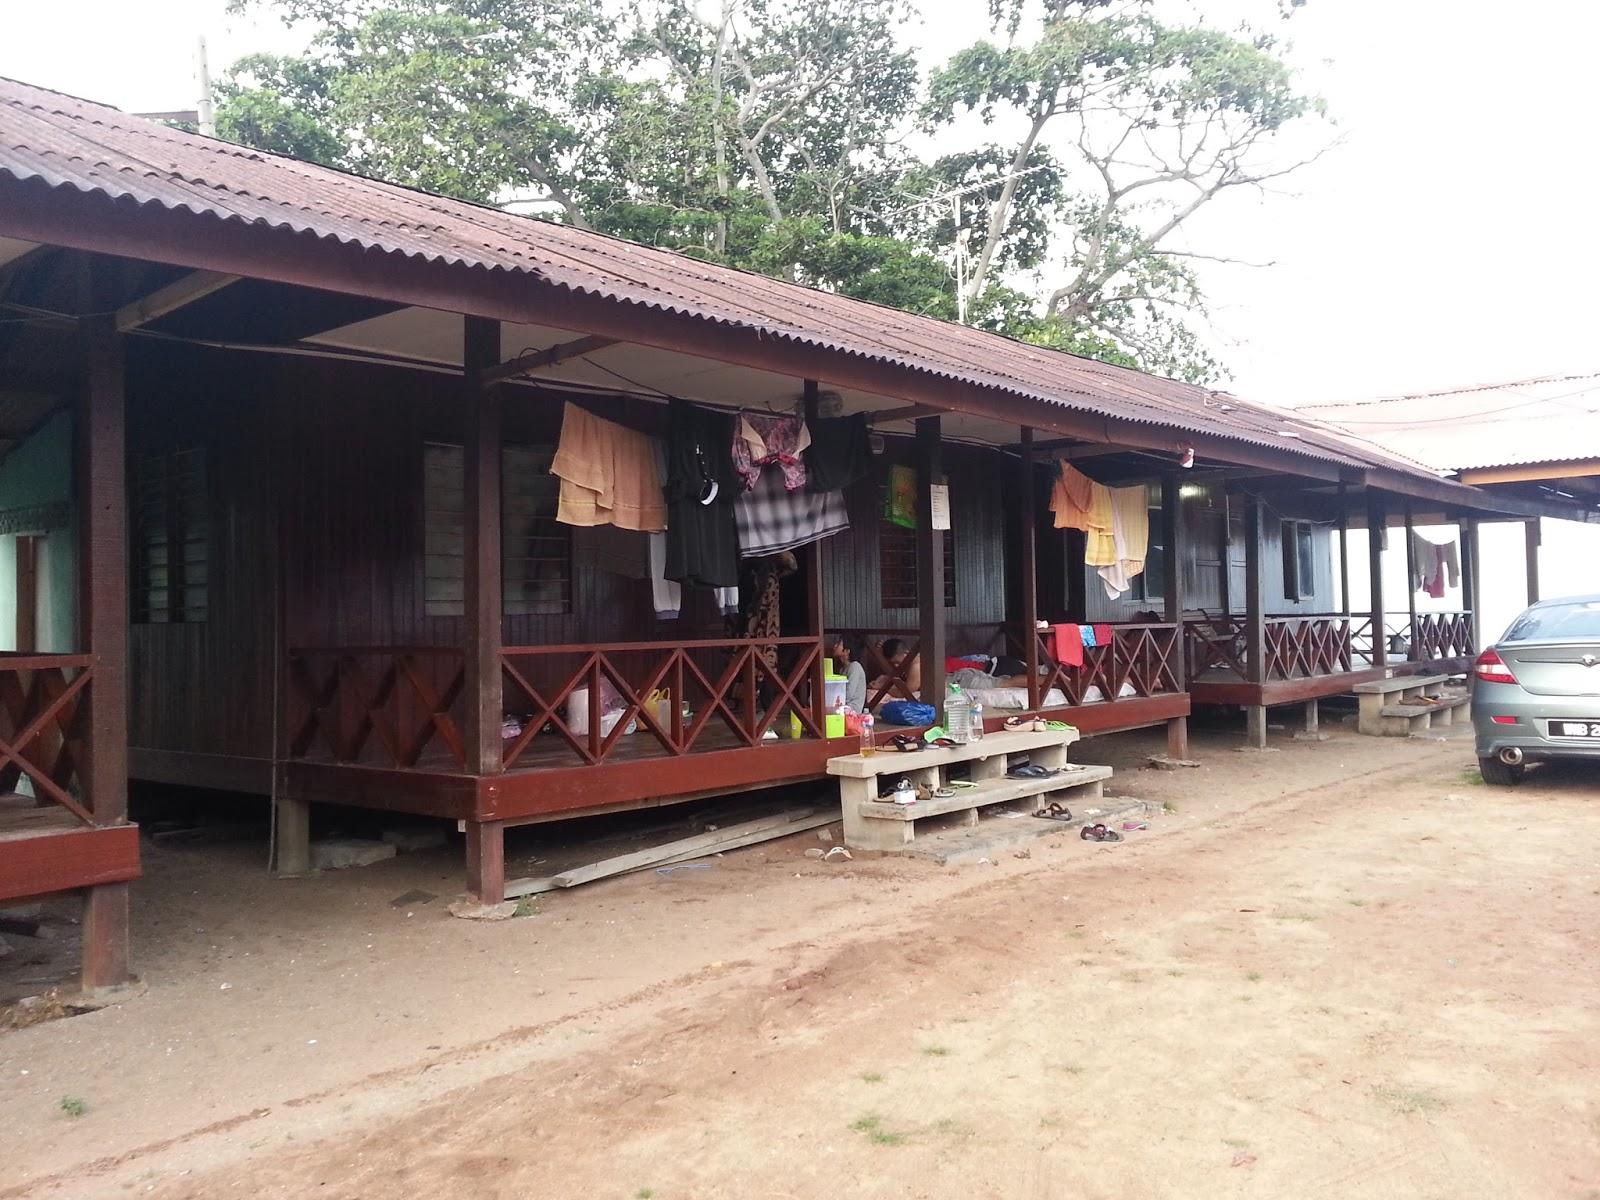 This Is Our Story Chalet Bajet Di Pengkalan Balak Melaka